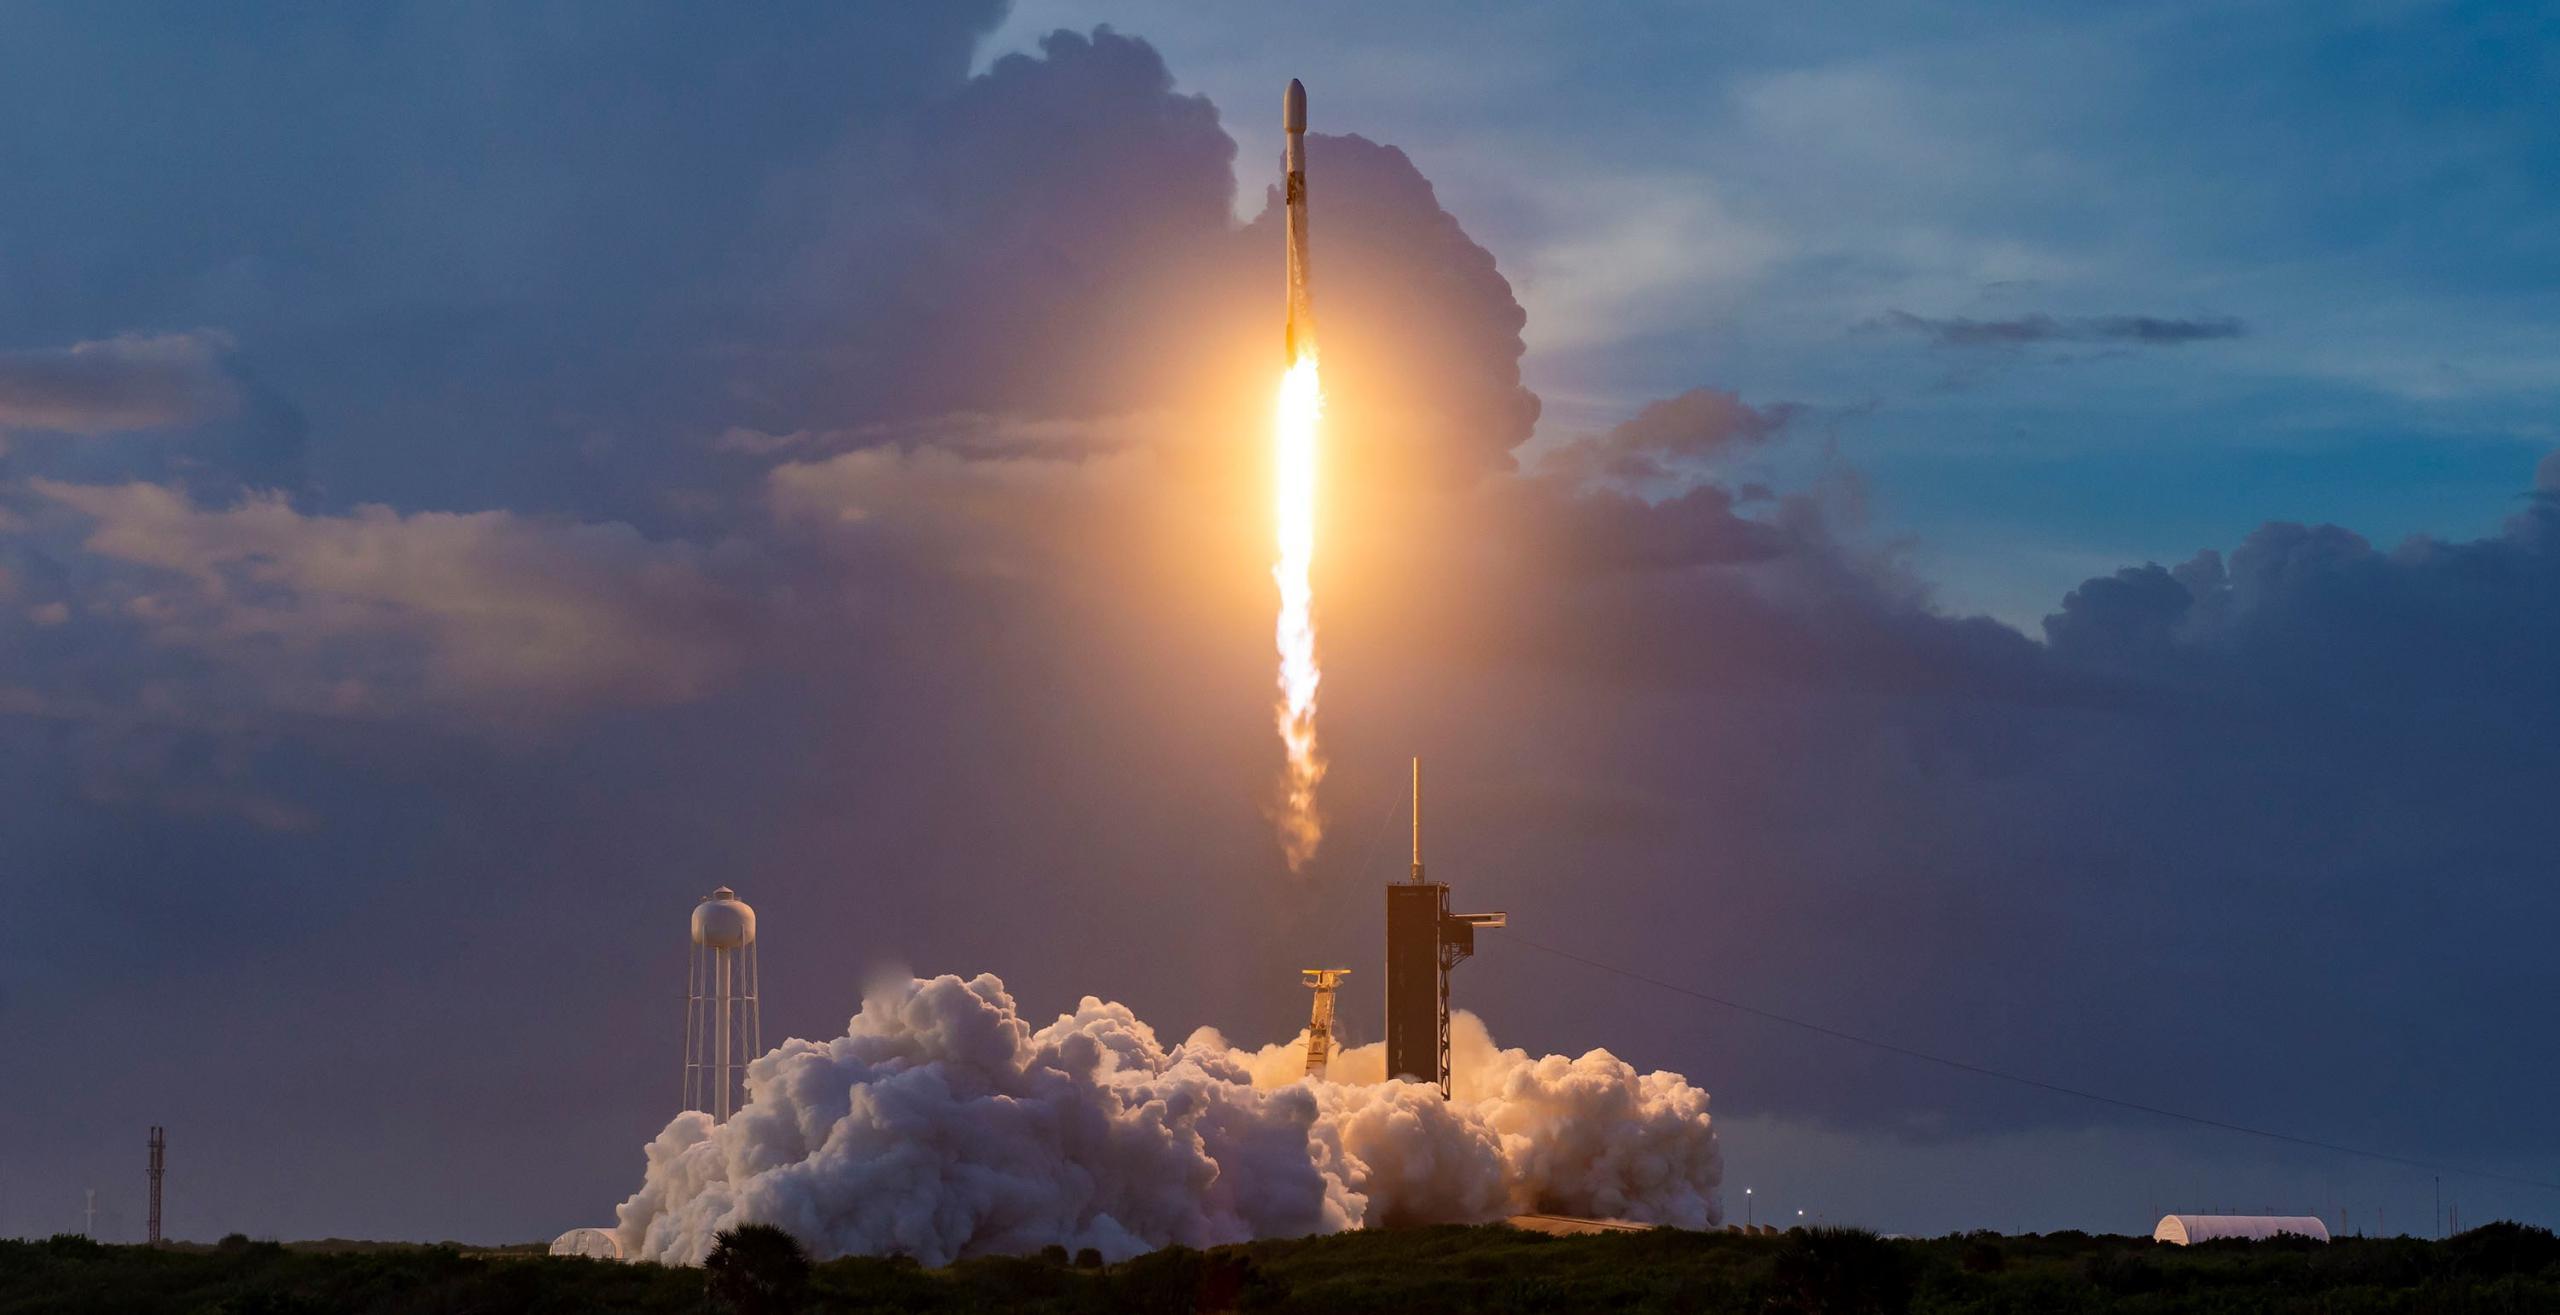 Starlink-12 F9 B1058 39A 100620 (SpaceX) 3 crop (c)